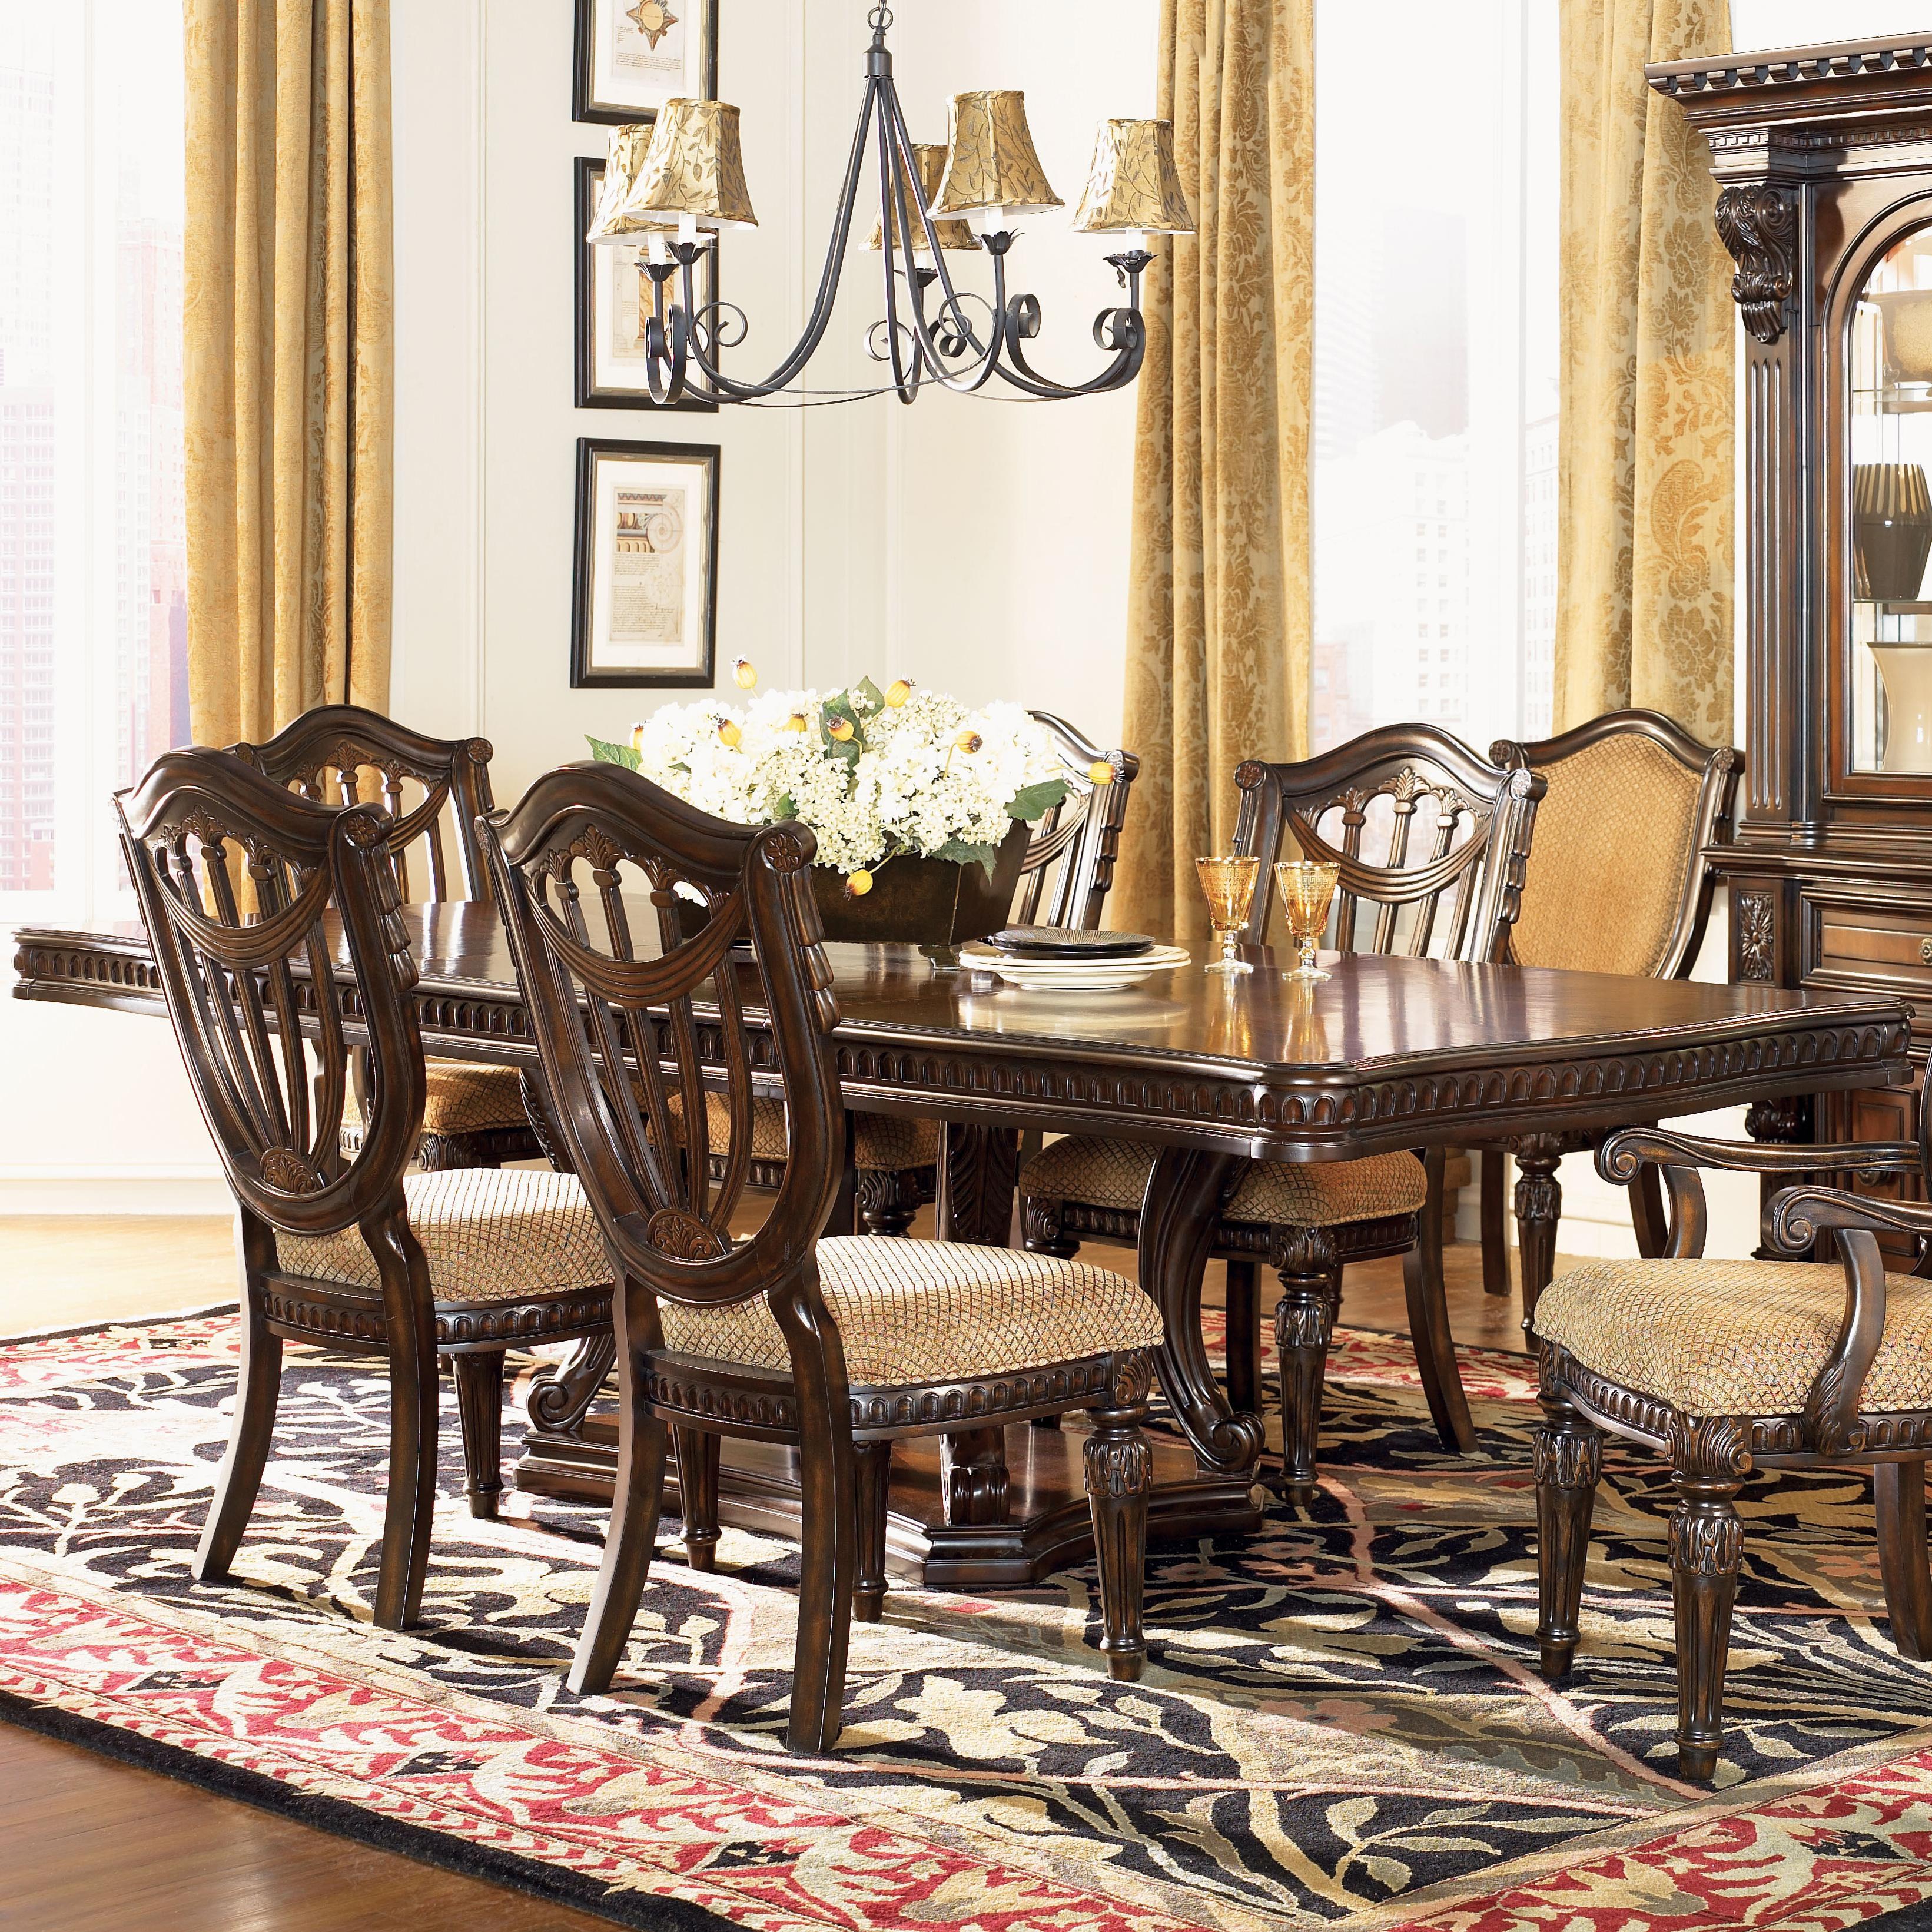 Setting Dining Room Table: Fairmont Designs Grand Estates Double Pedestal Rectangular